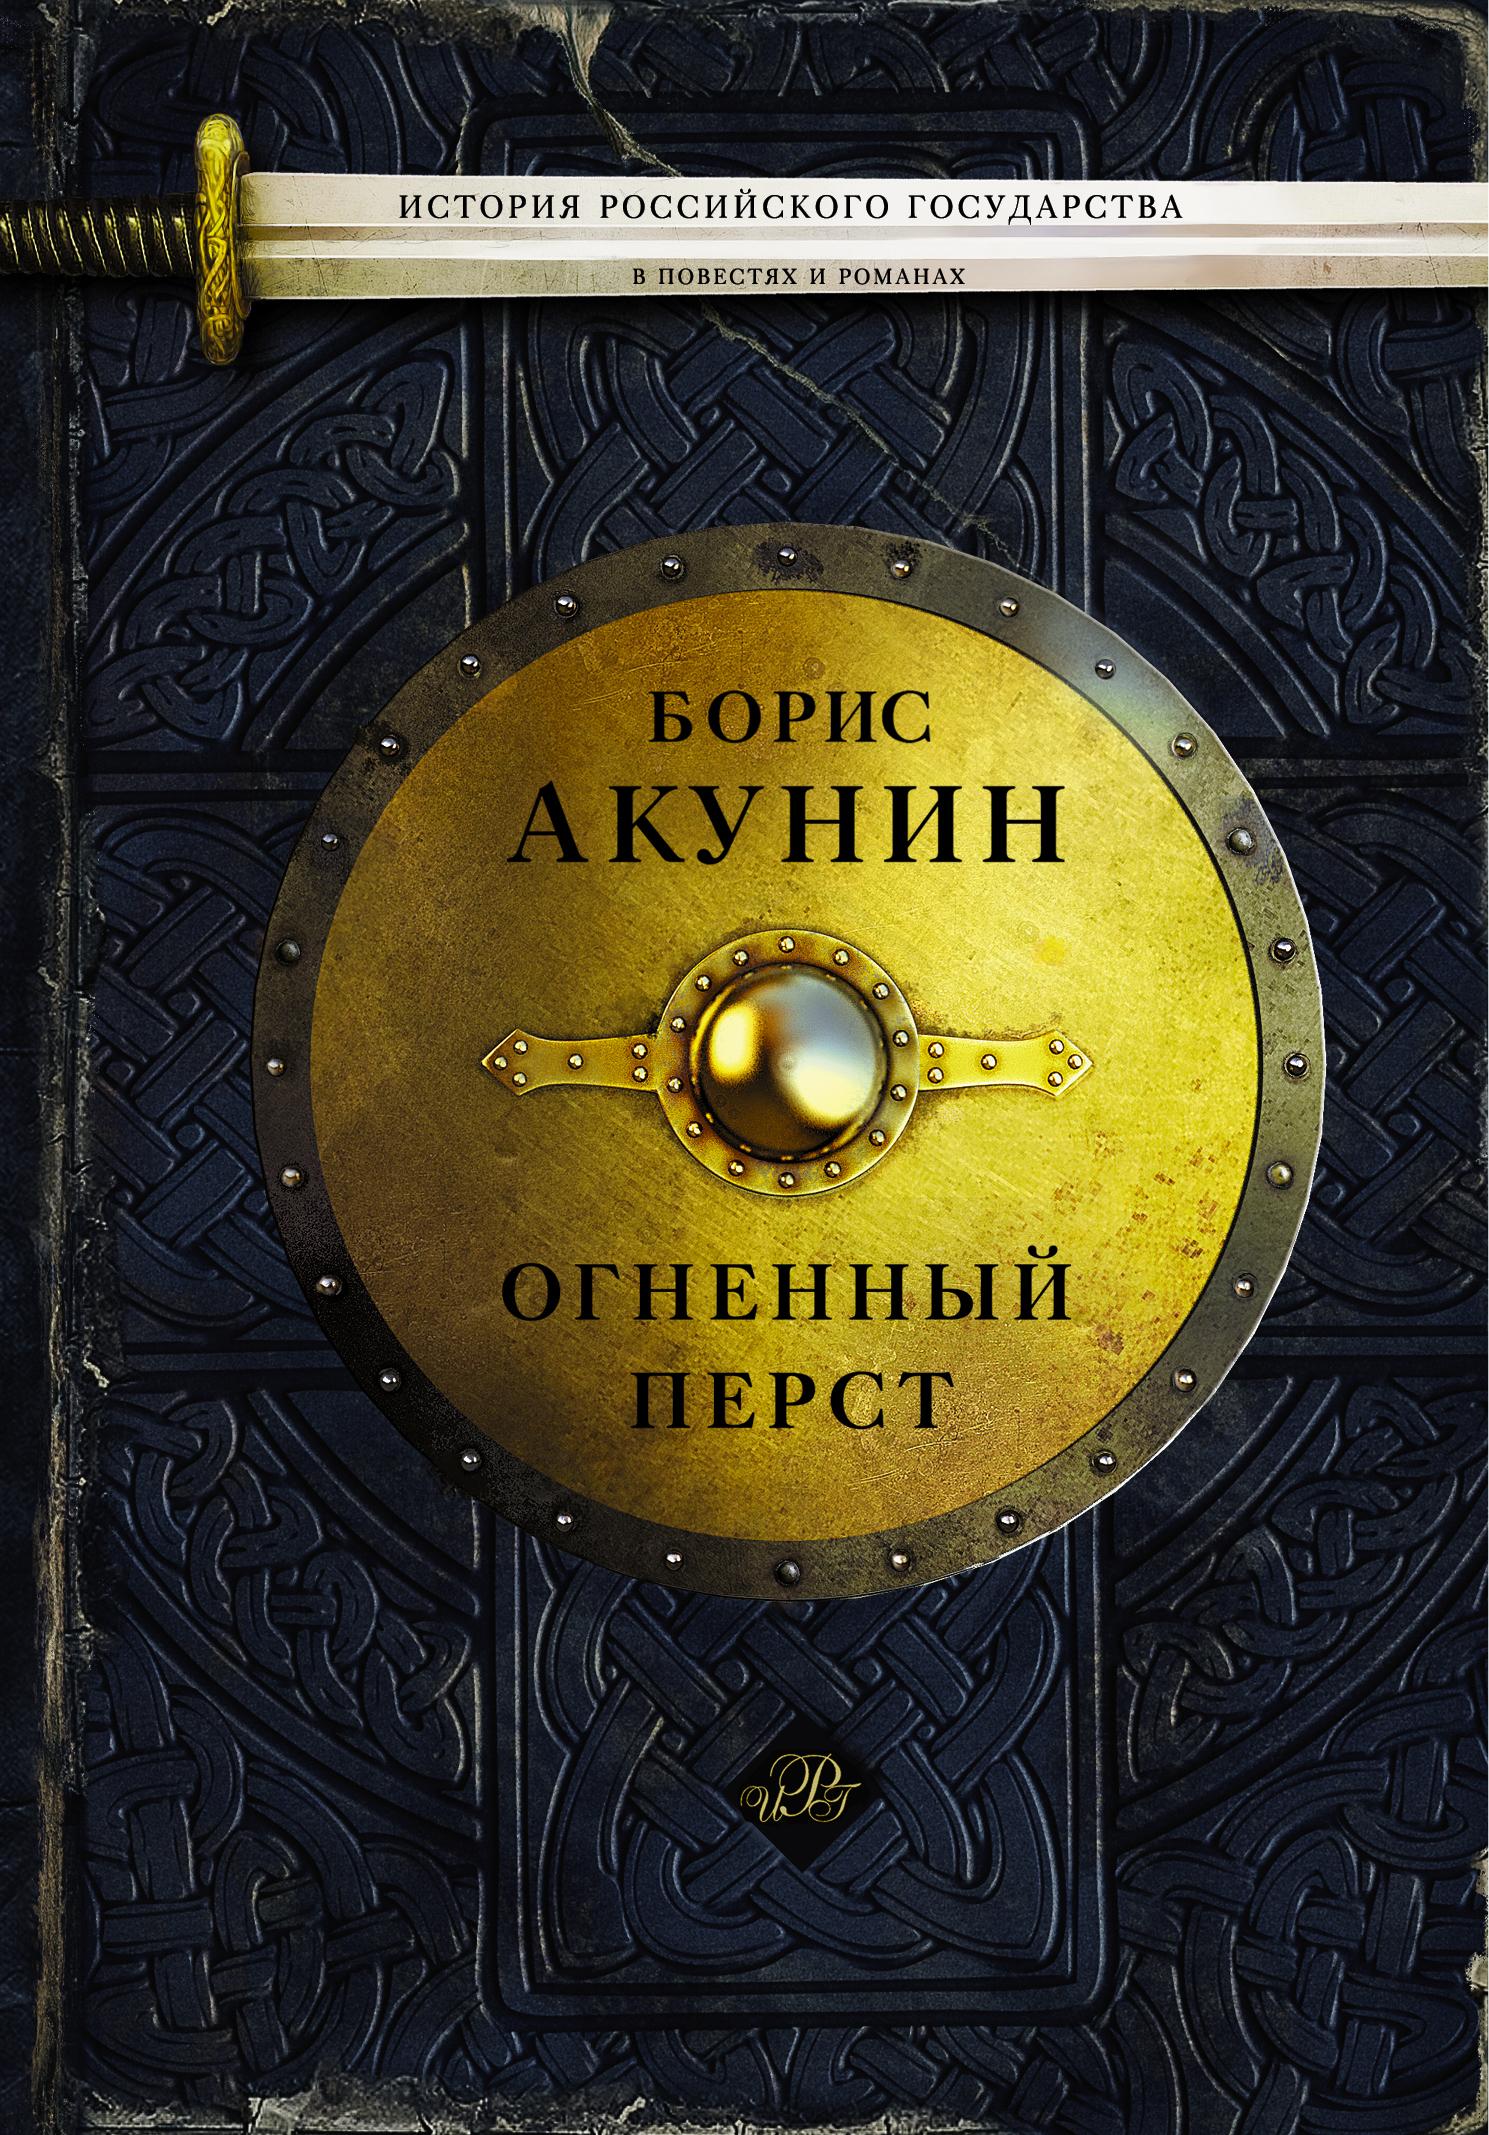 Борис Акунин Огненный перст акунин борис огненный перст повести